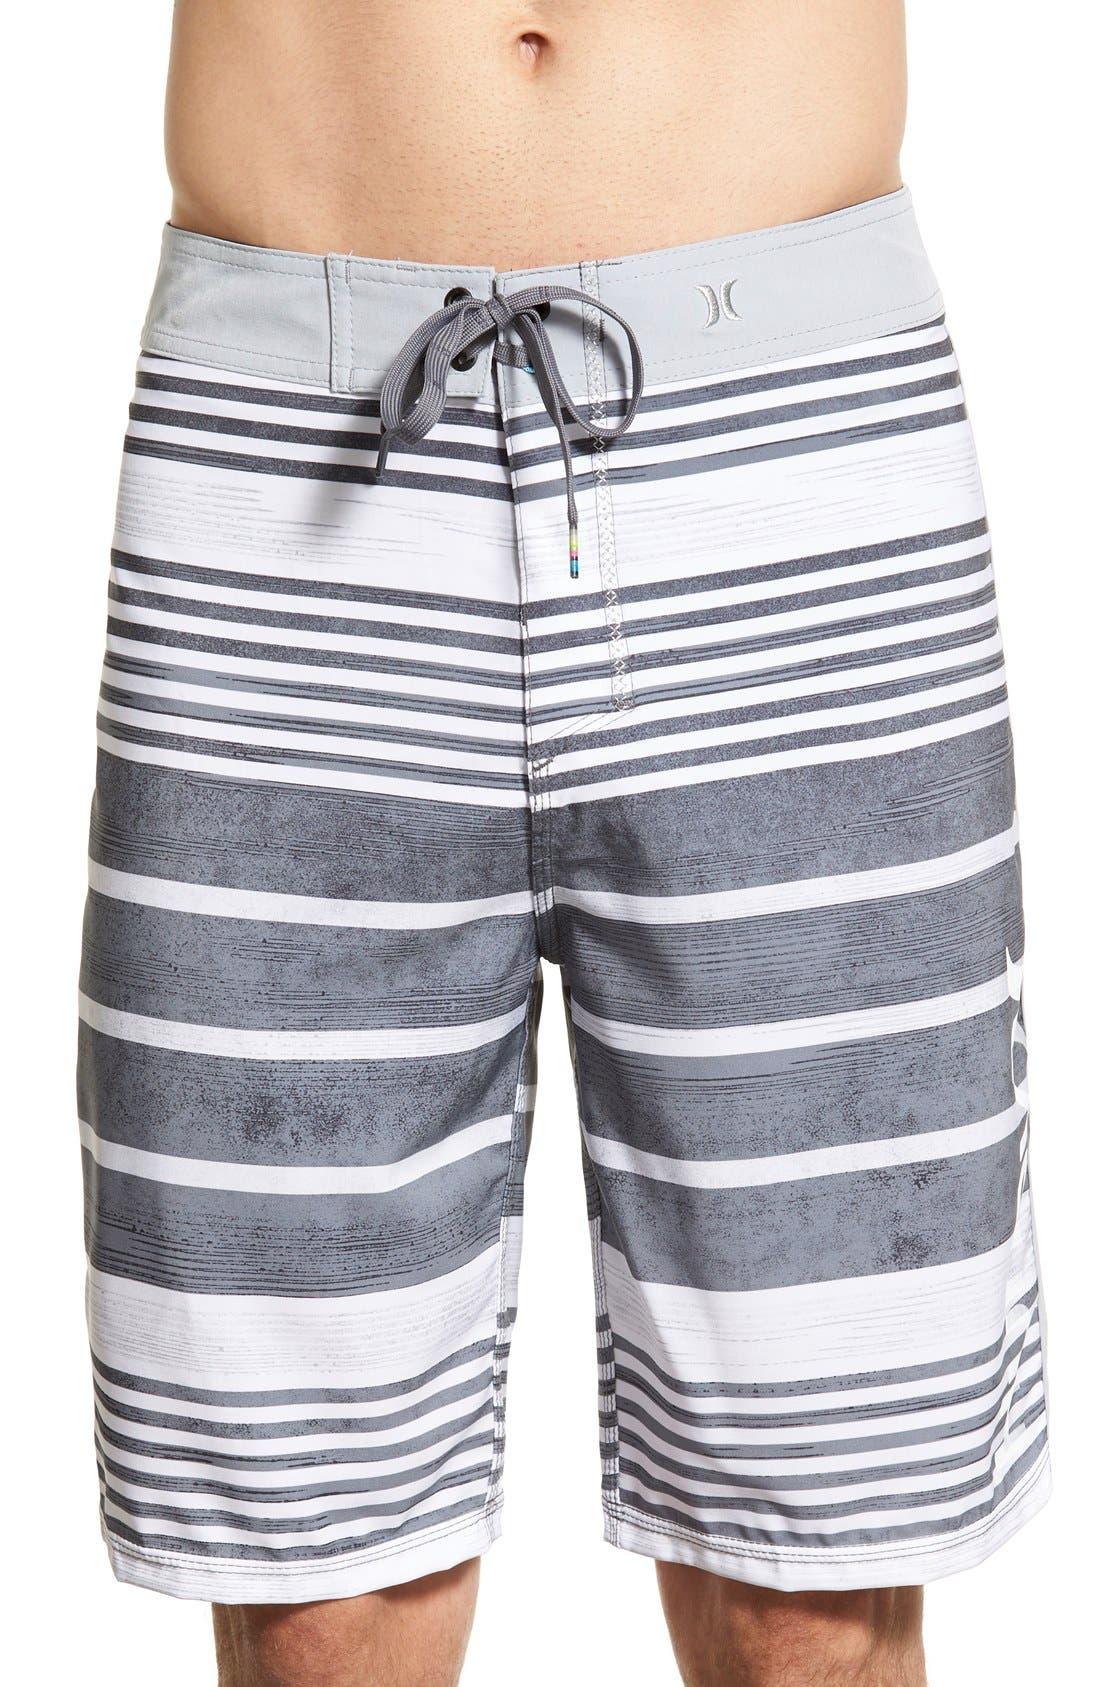 'Phantom Hightide' Water-Repellent Board Shorts, Main, color, 060